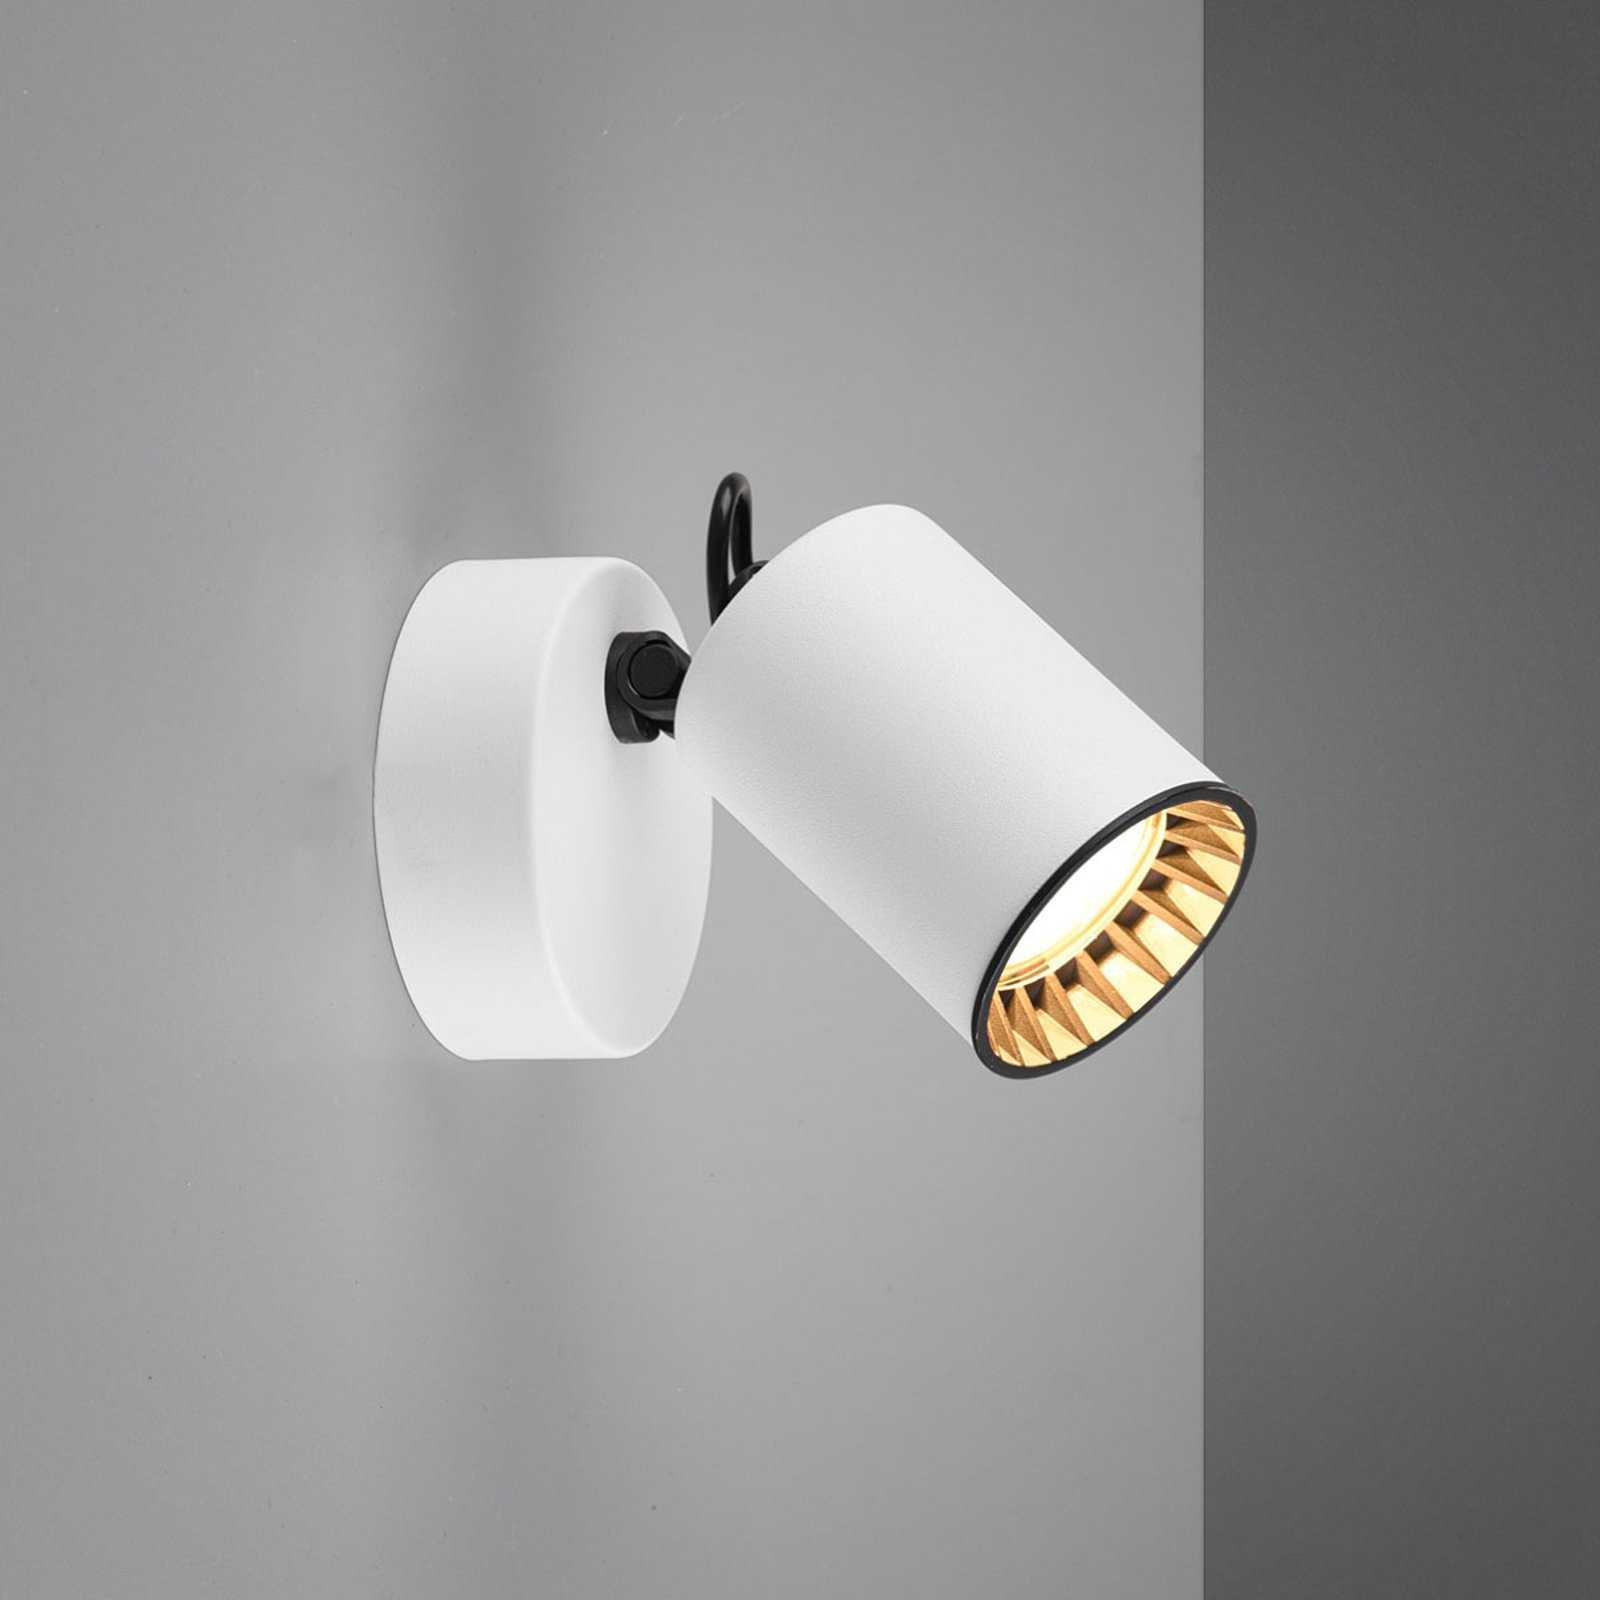 Vegglampe Pago, 1 lyskilde, hvit